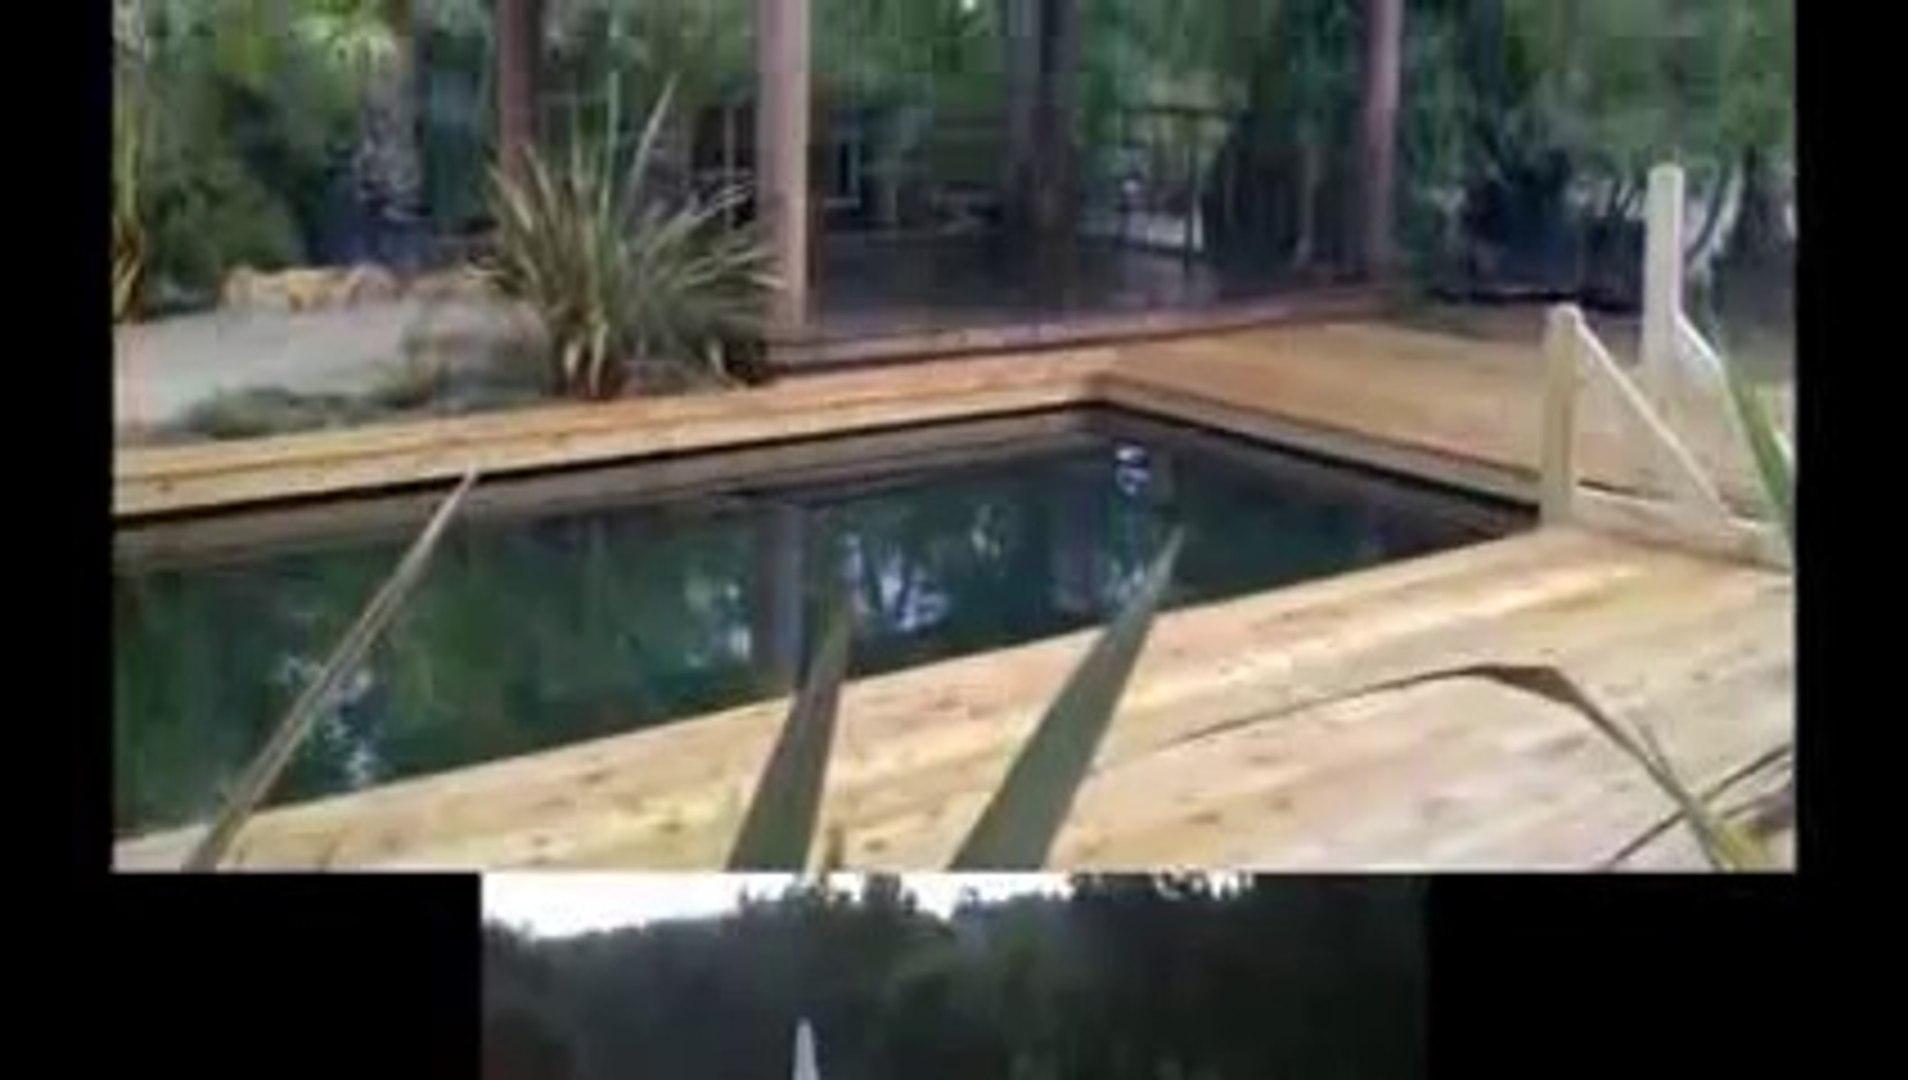 Constructeur De Piscine Paris odyssea piscines fabricant de piscines 100 % bois